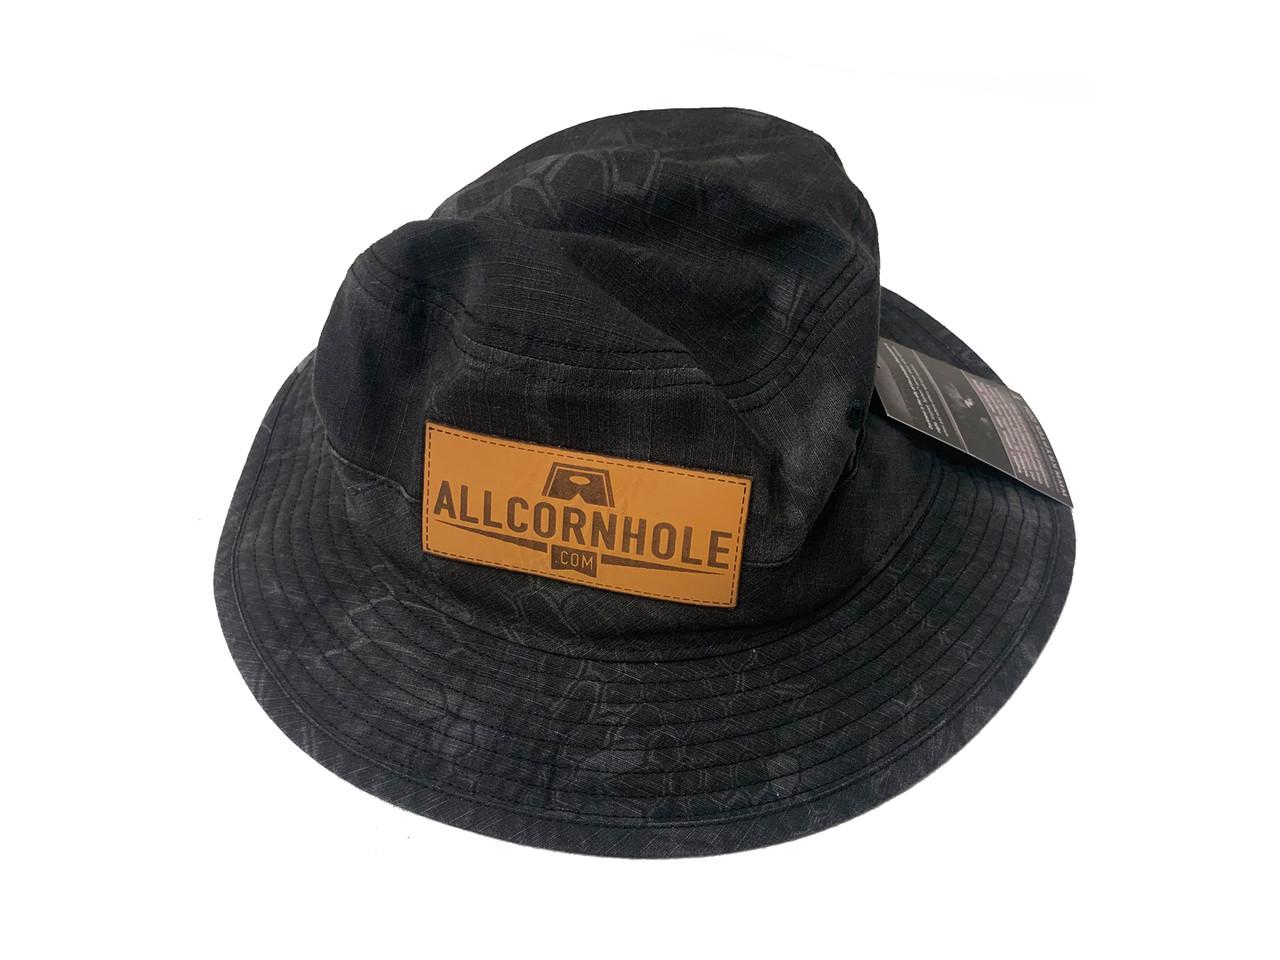 6eff3a1b2a3da AllCornhole Black Design Bucket Hat - Free Shipping - AllCornhole.com